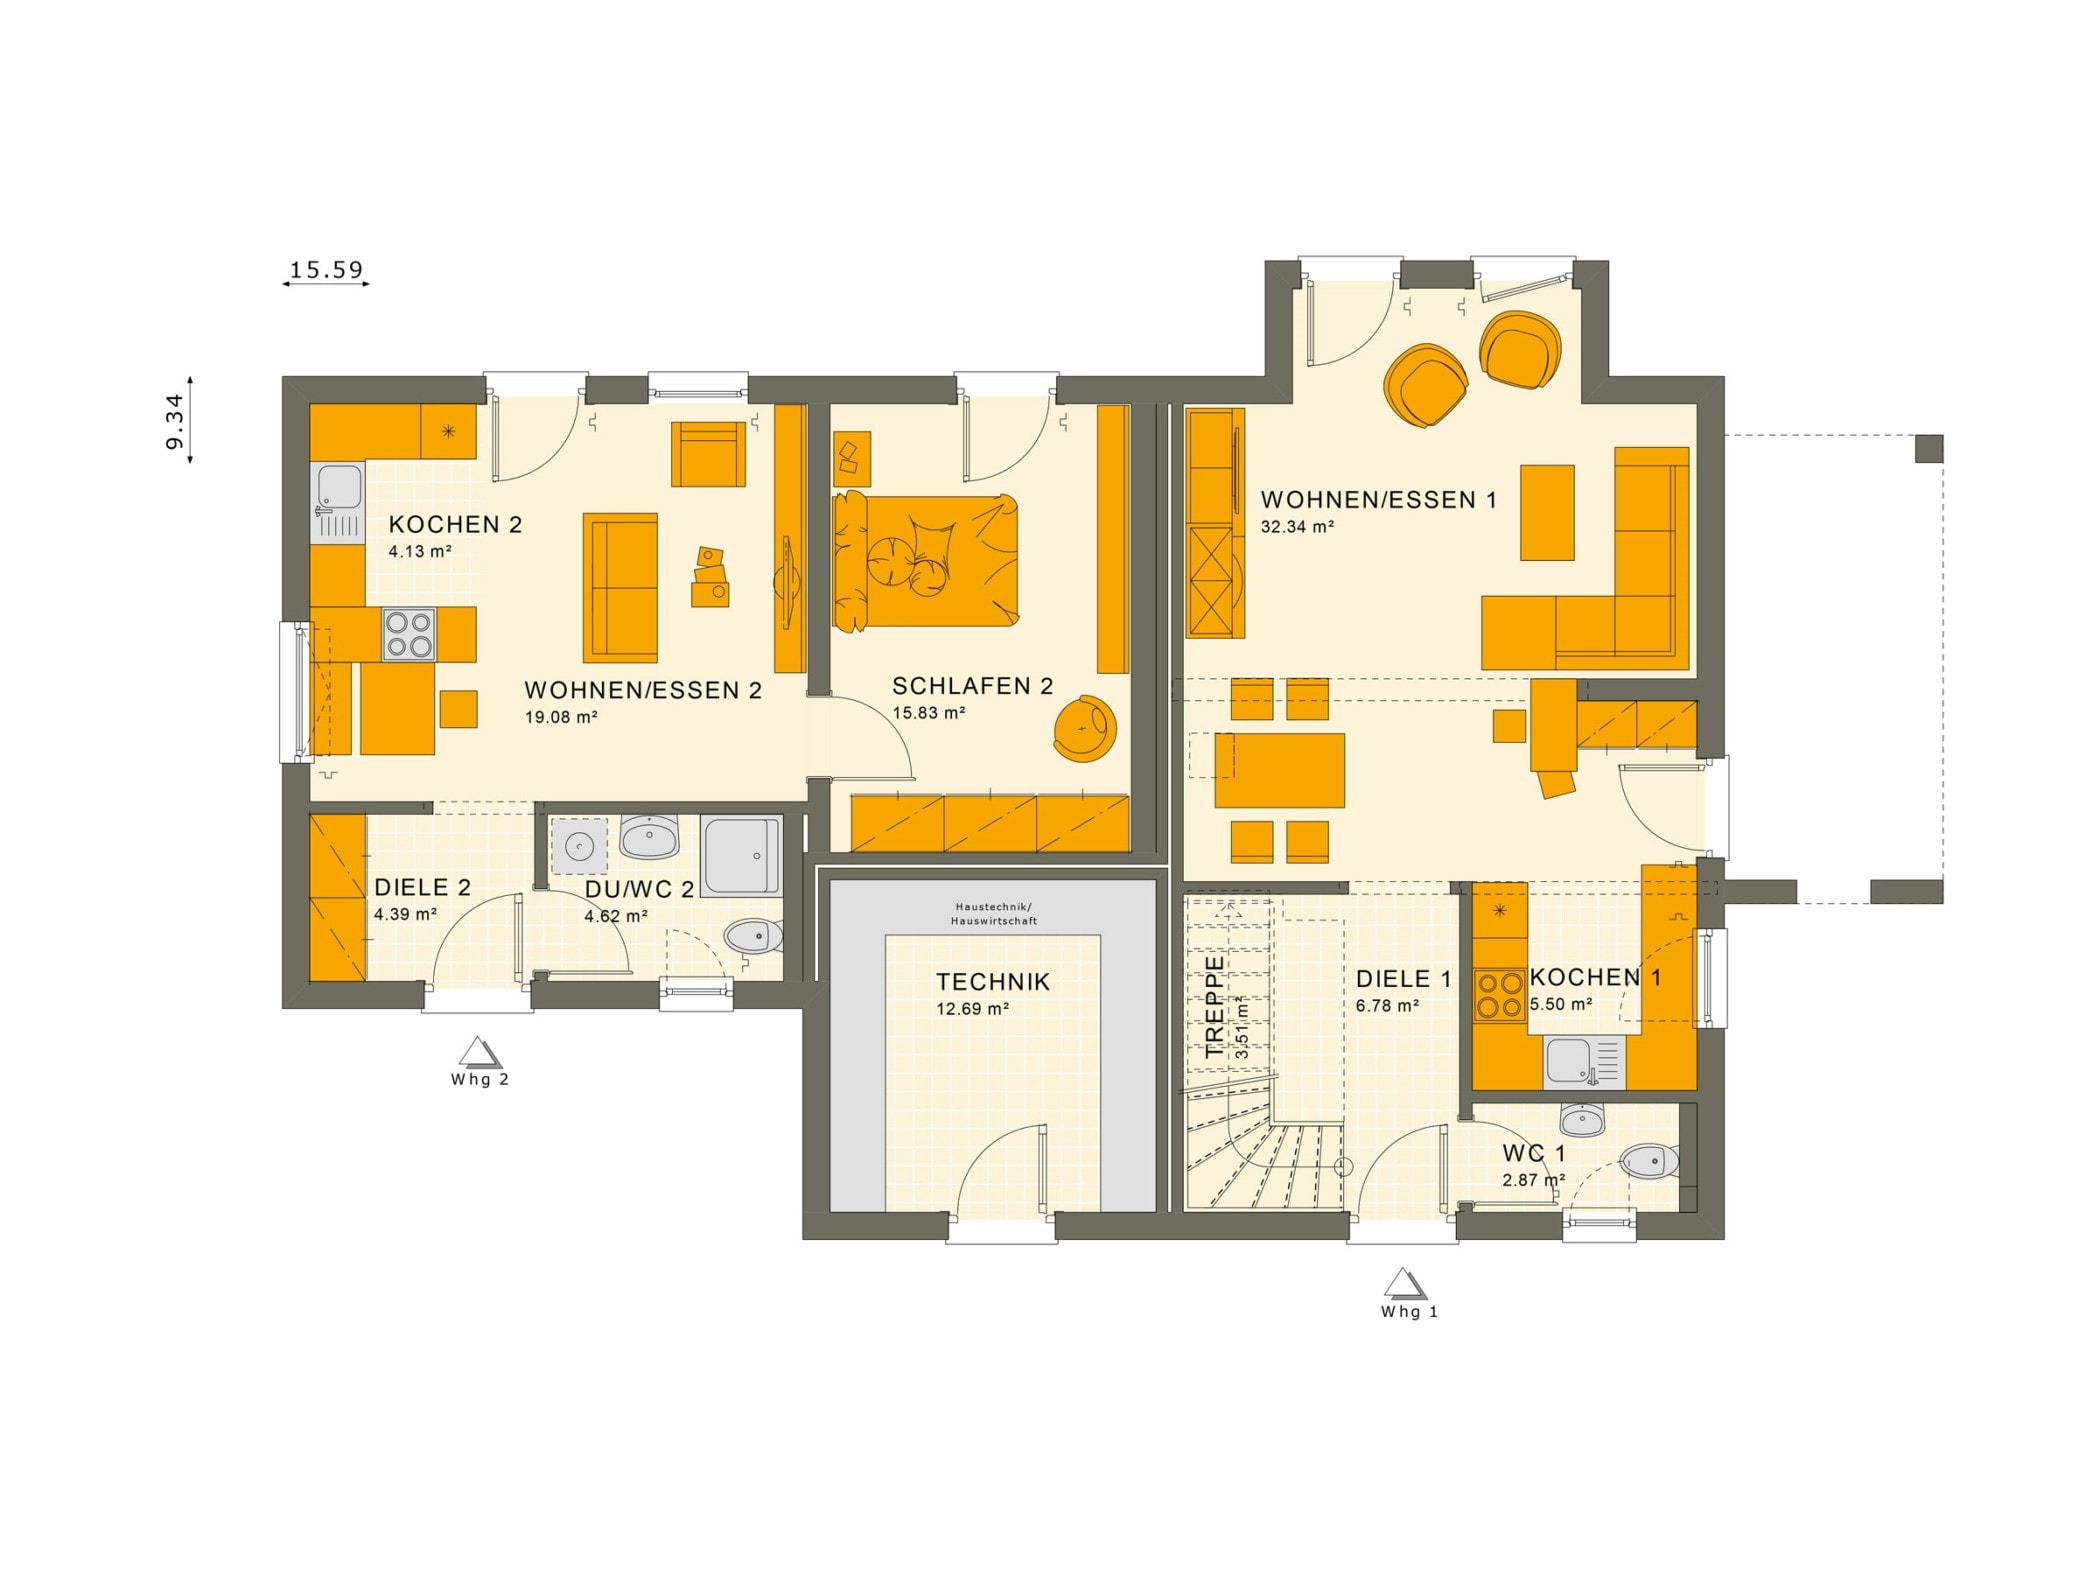 Grundriss Einfamilienhaus mit Einliegerwohnung Erdgeschoss, 7 Zimmer, 180 qm - Fertighaus schlüsselfertig bauen Ideen Living Haus SOLUTION 183 V4 - HausbauDirekt.de